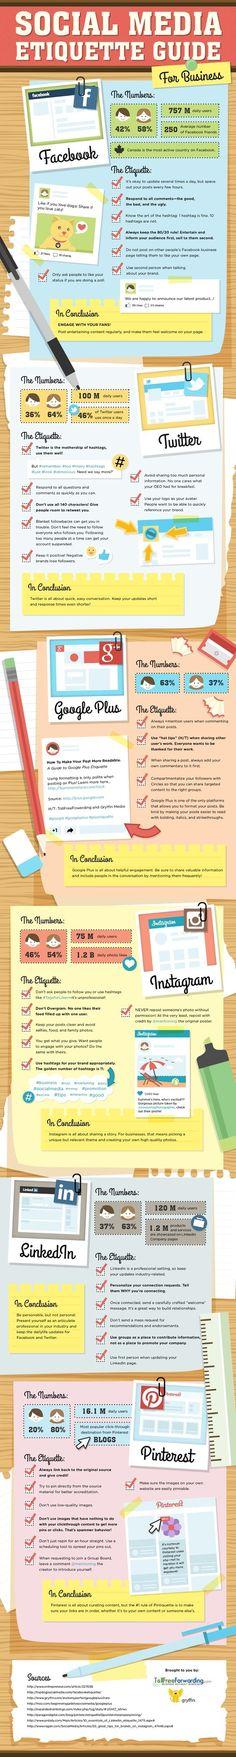 GooglePlus, Twitter, Instagram, Facebook, Pinterest - Social Media Etiquette Guide For Business - #infographic | Time to Learn | Scoop.it